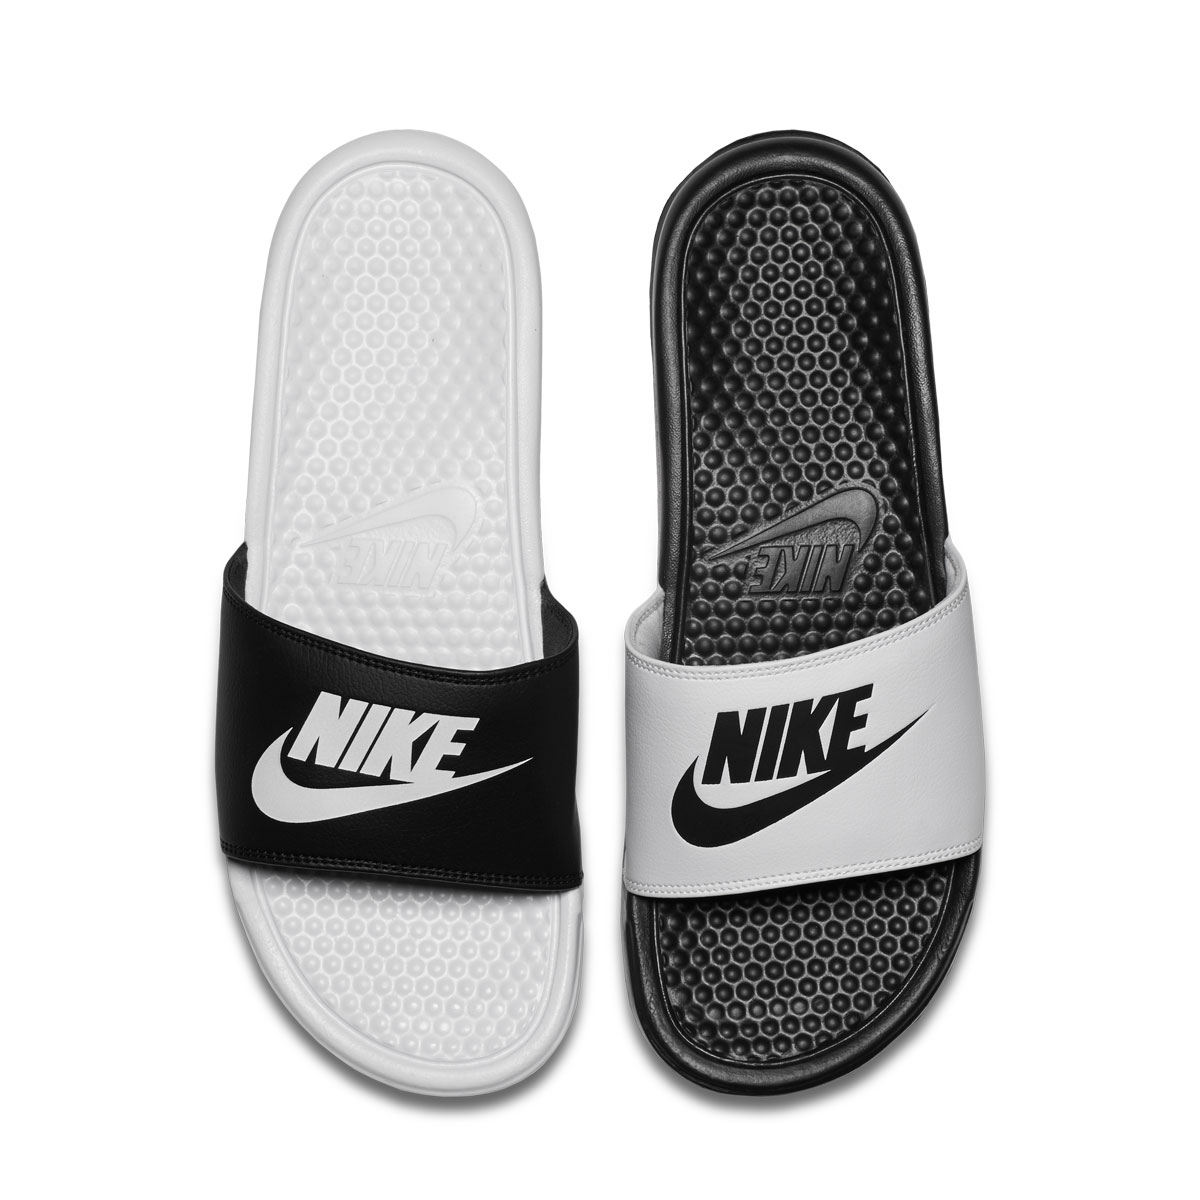 b99e99145f Categories. « All Categories · Shoes · Men's Shoes · Sandal · Comfort  Sandal · NIKE BENASSI JDI MISMATCH ...